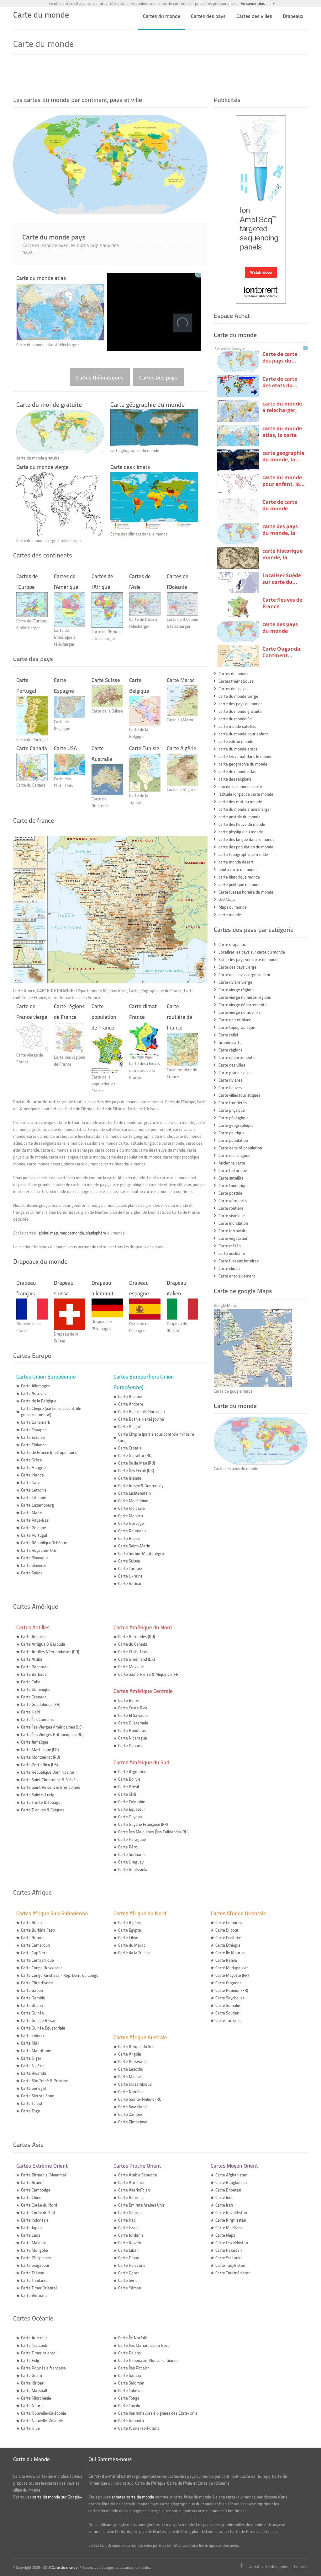 Carte Du Monde Qatar.Carte Du Monde Competitors Revenue And Employees Owler Company